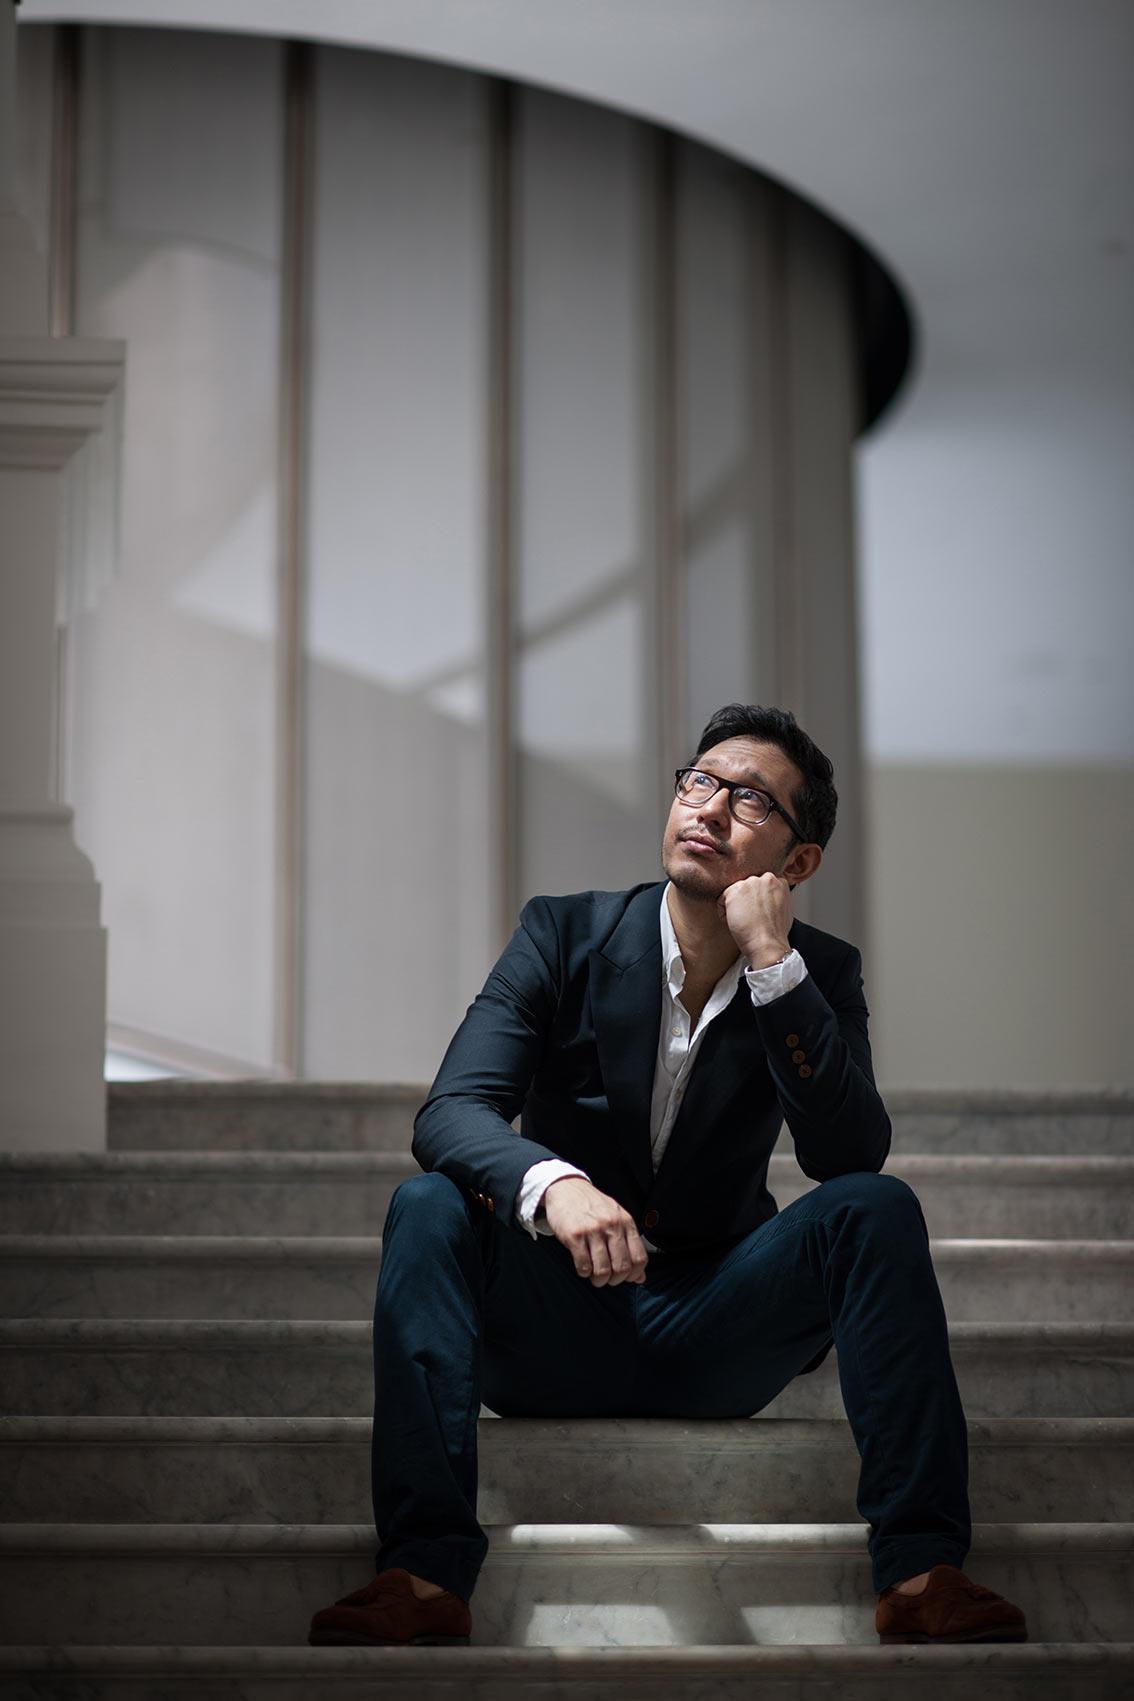 portrait photography, Jason Lai, Associate Conductor, Singapore Symphony Orchestra, Victoria Concert Hall, natural light